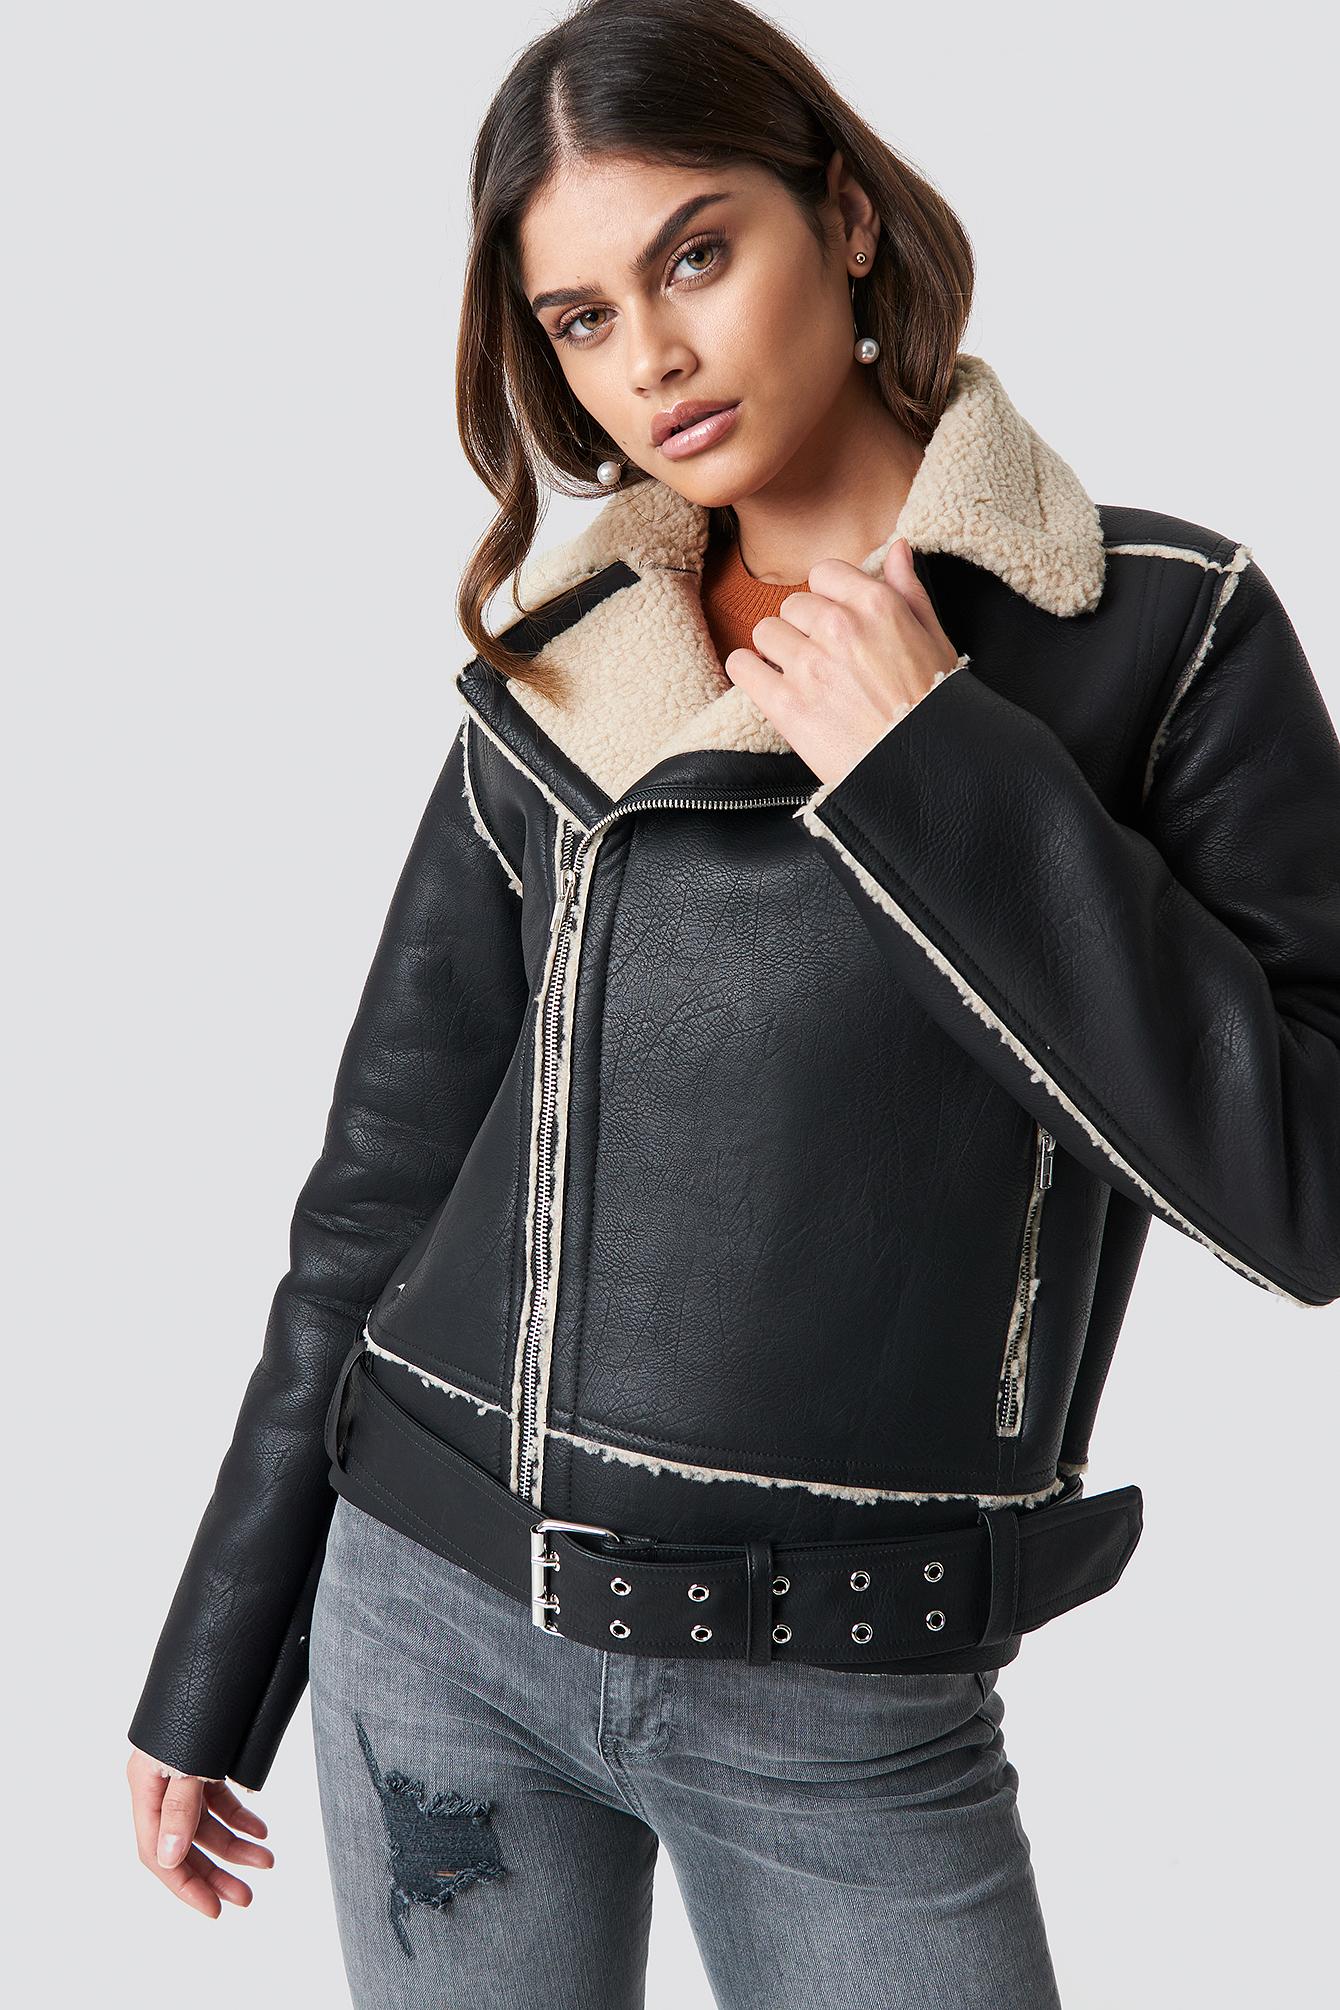 Pilotjacka skinn herr | faux leather jacket | Styleitaly.se